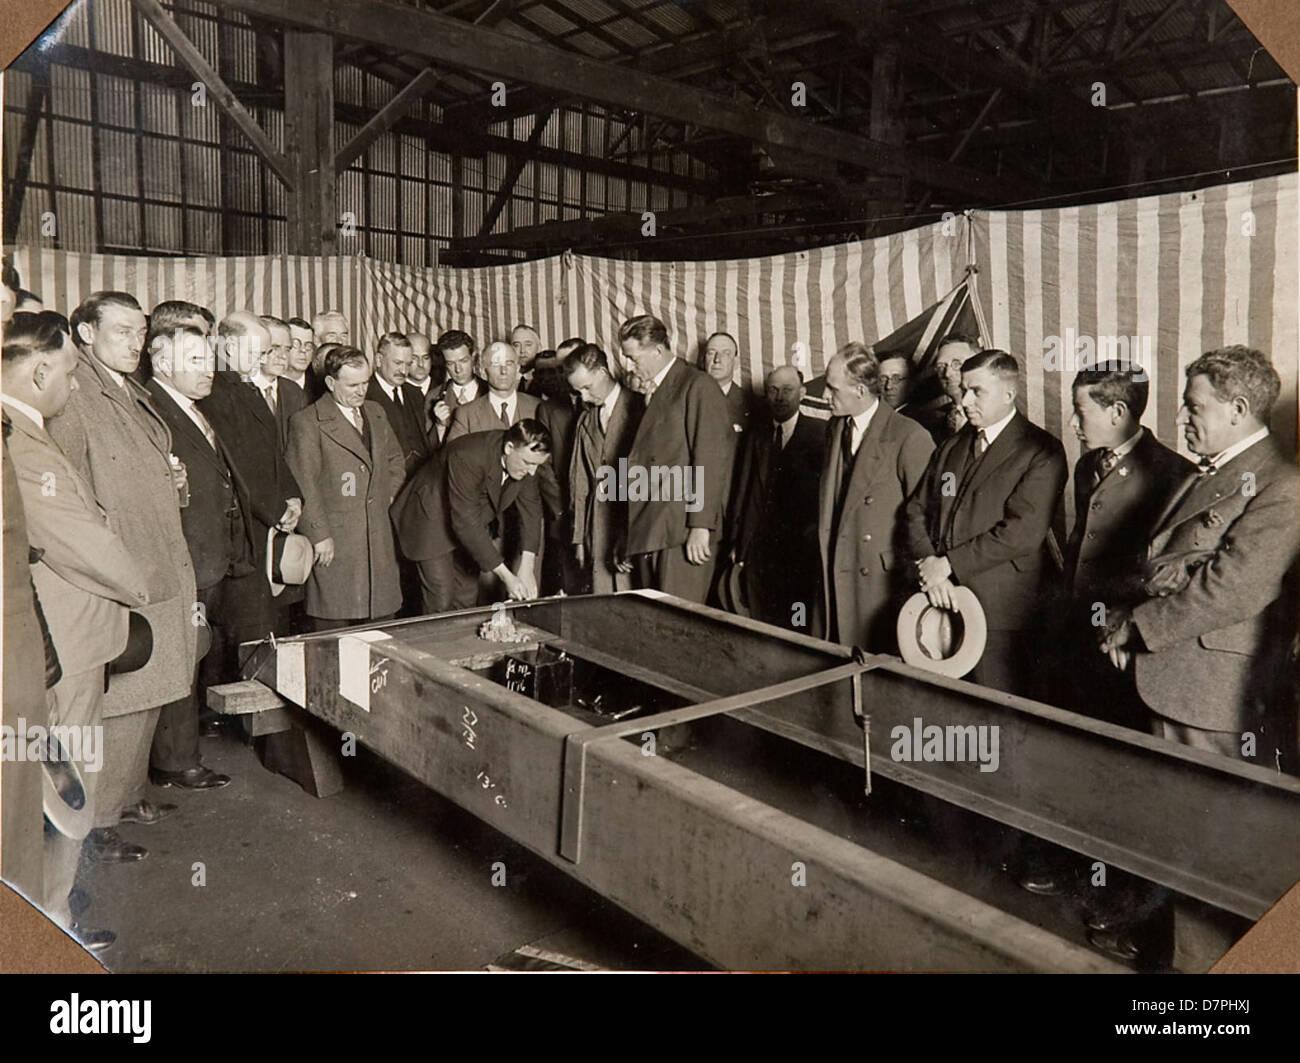 Men inspecting the frame of the car 'F.H. Stewart Enterprise', 1926 - 1936 - Stock Image